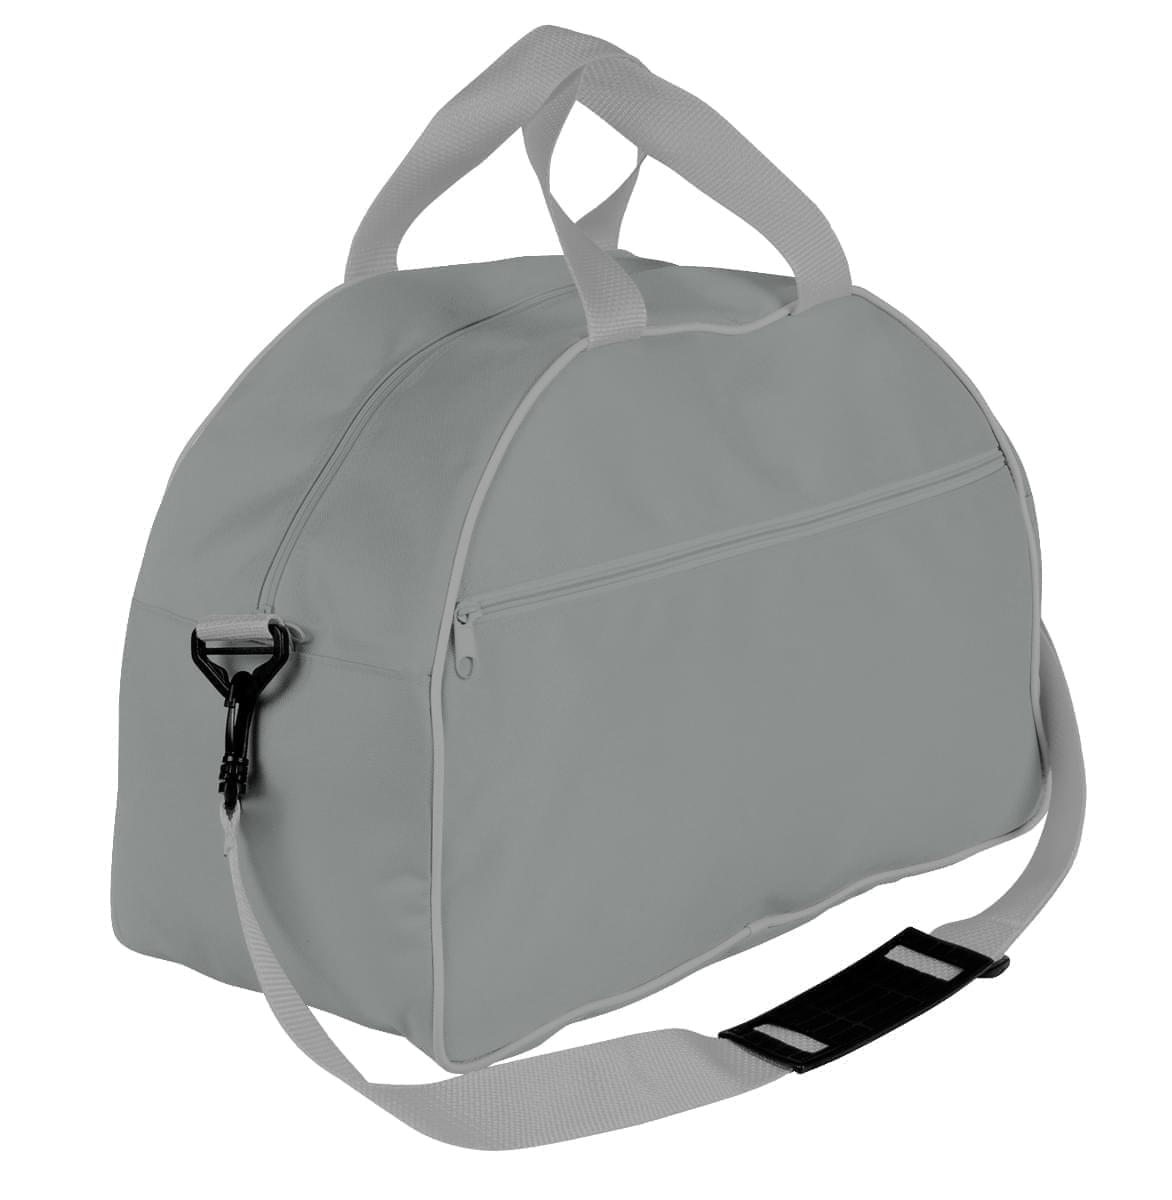 USA Made Nylon Poly Weekender Duffel Bags, Grey-Grey, 6PKV32JA1U